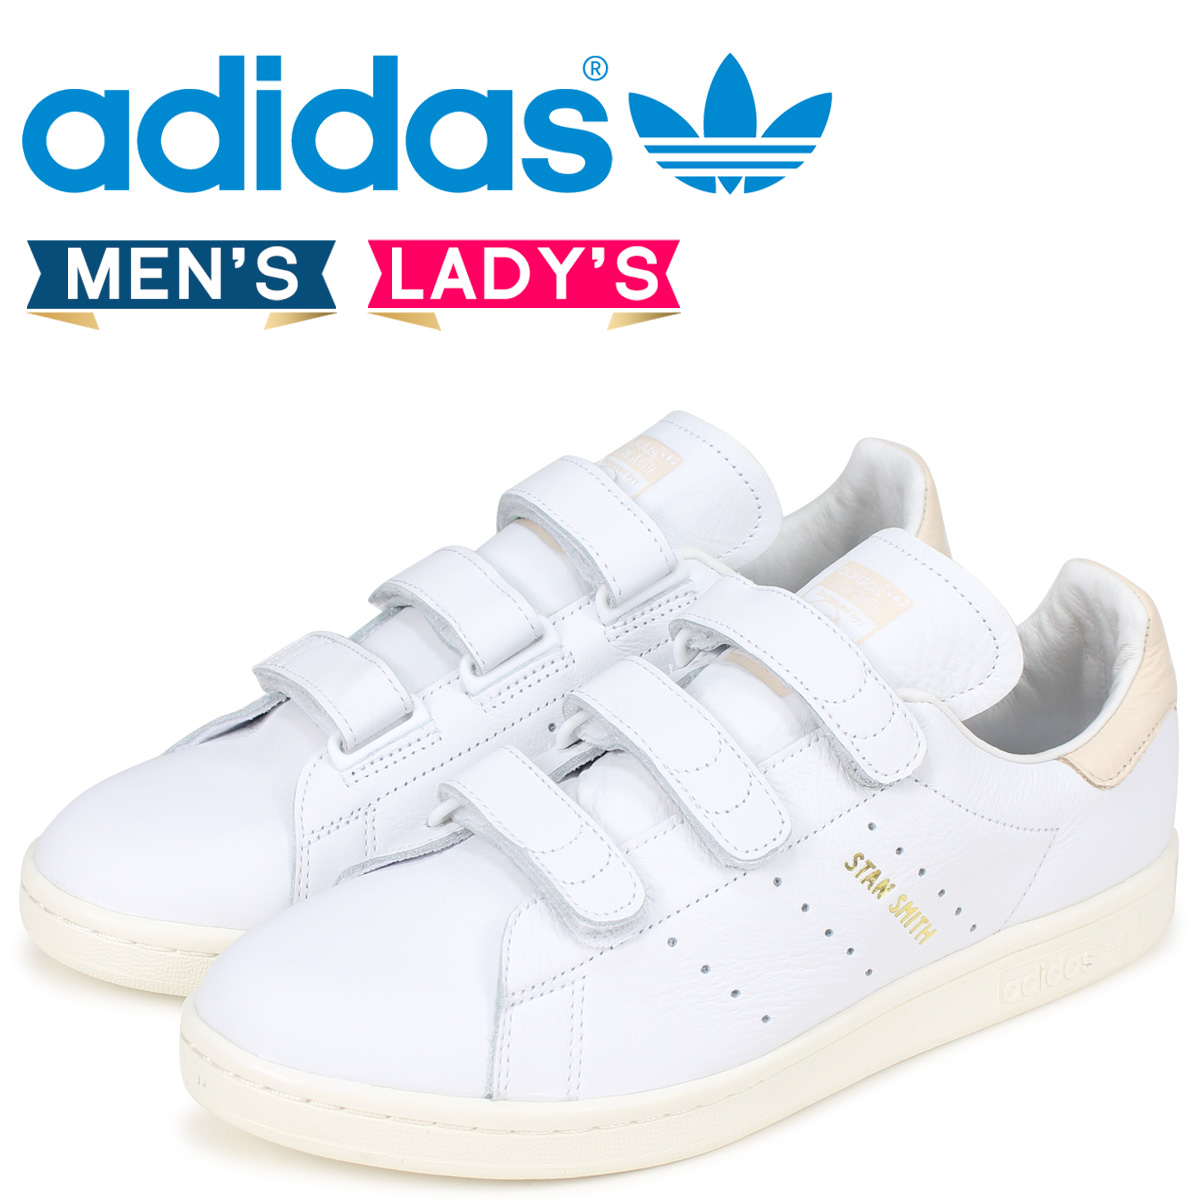 adidas Originals スタンスミス アディダス オリジナルス スニーカー メンズ レディース STAN SMITH CF F36573 ホワイト